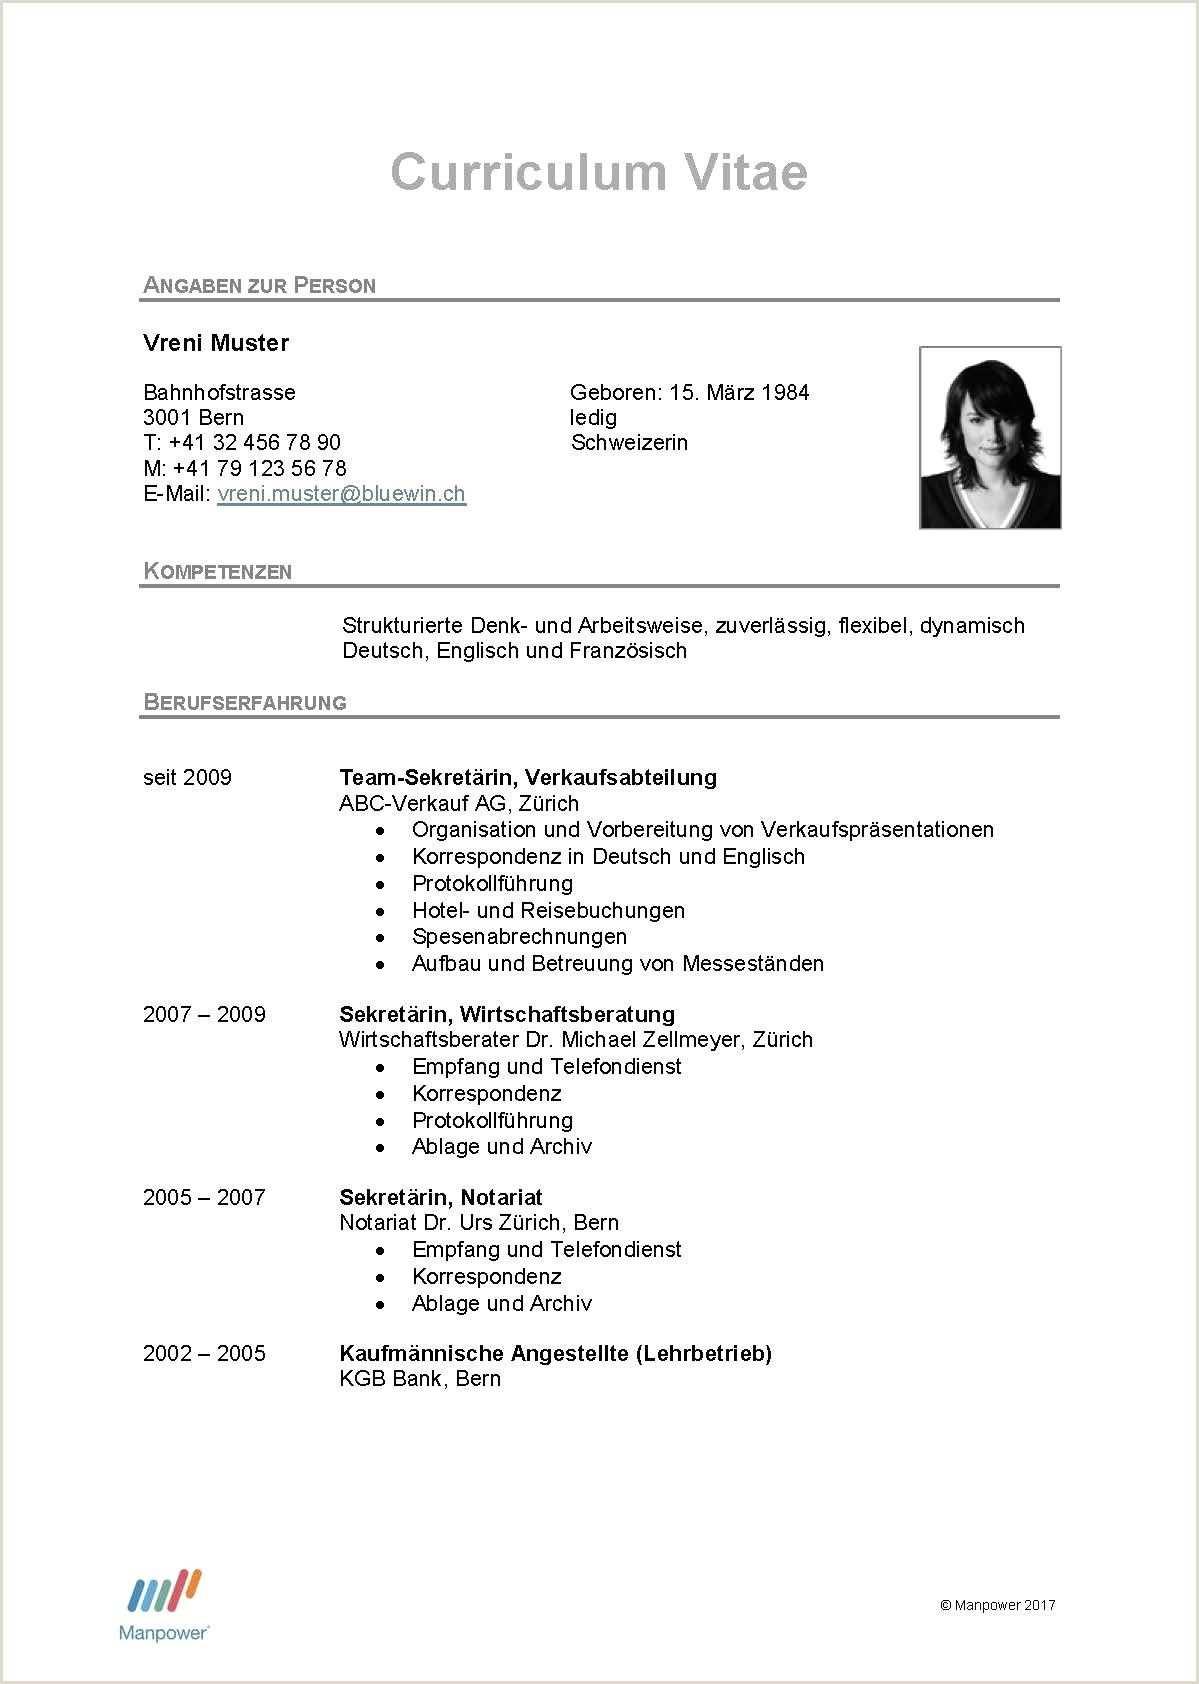 Lebenslauf Muster Fsj Type Of Resume And Sample Lebenslauf Muster